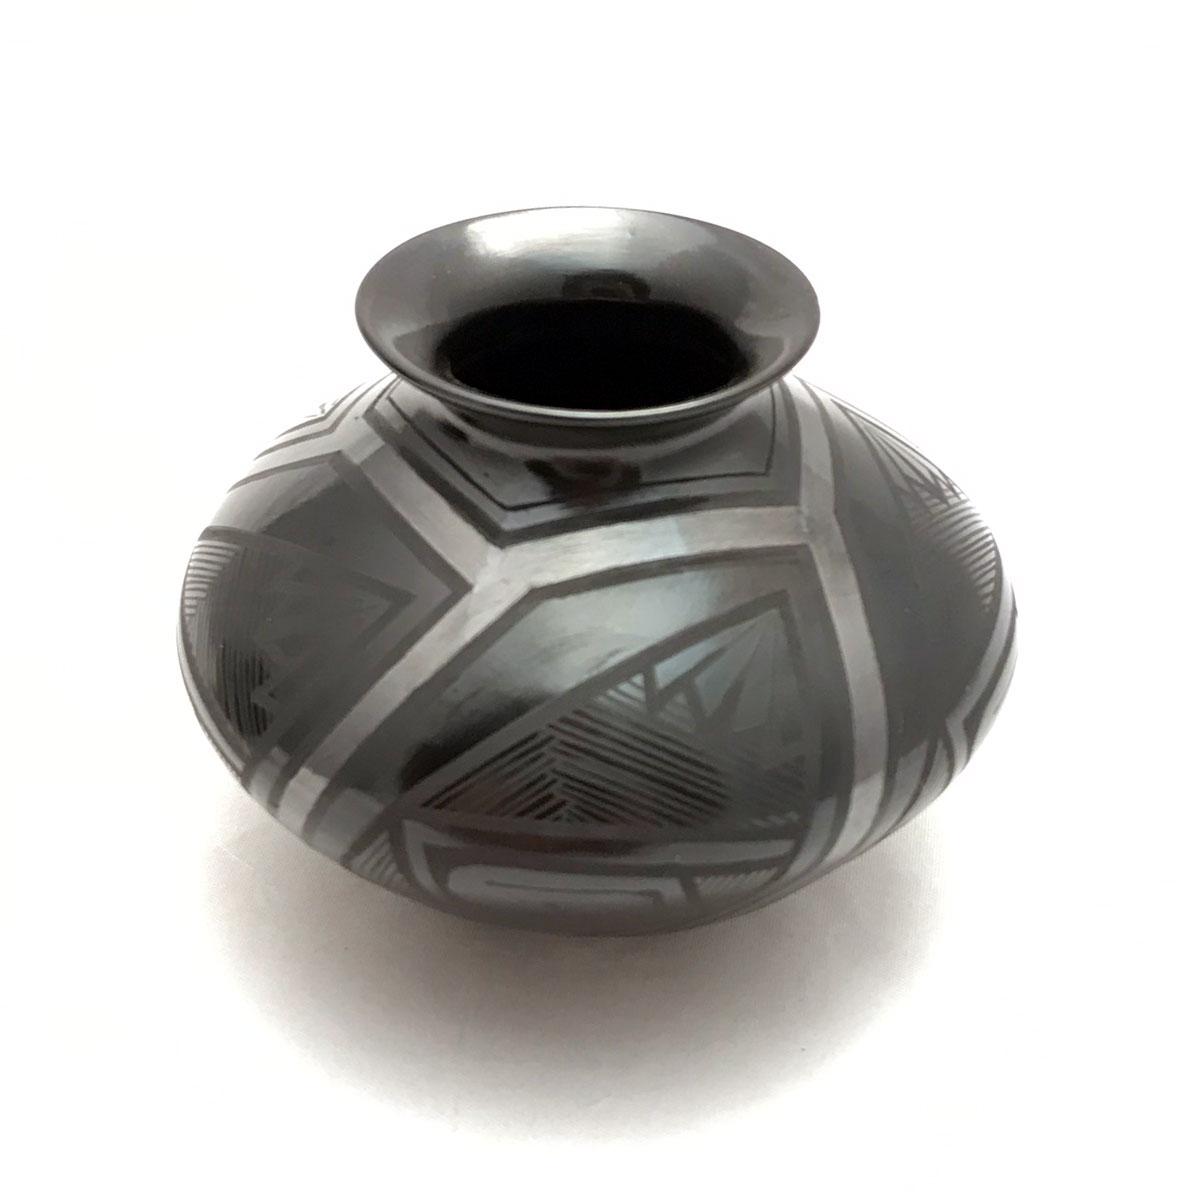 Salvador Baca & Virginia Lazoya Salvador Baca & Virginia Lazoya: Small Black Vase Mata Ortiz Pottery